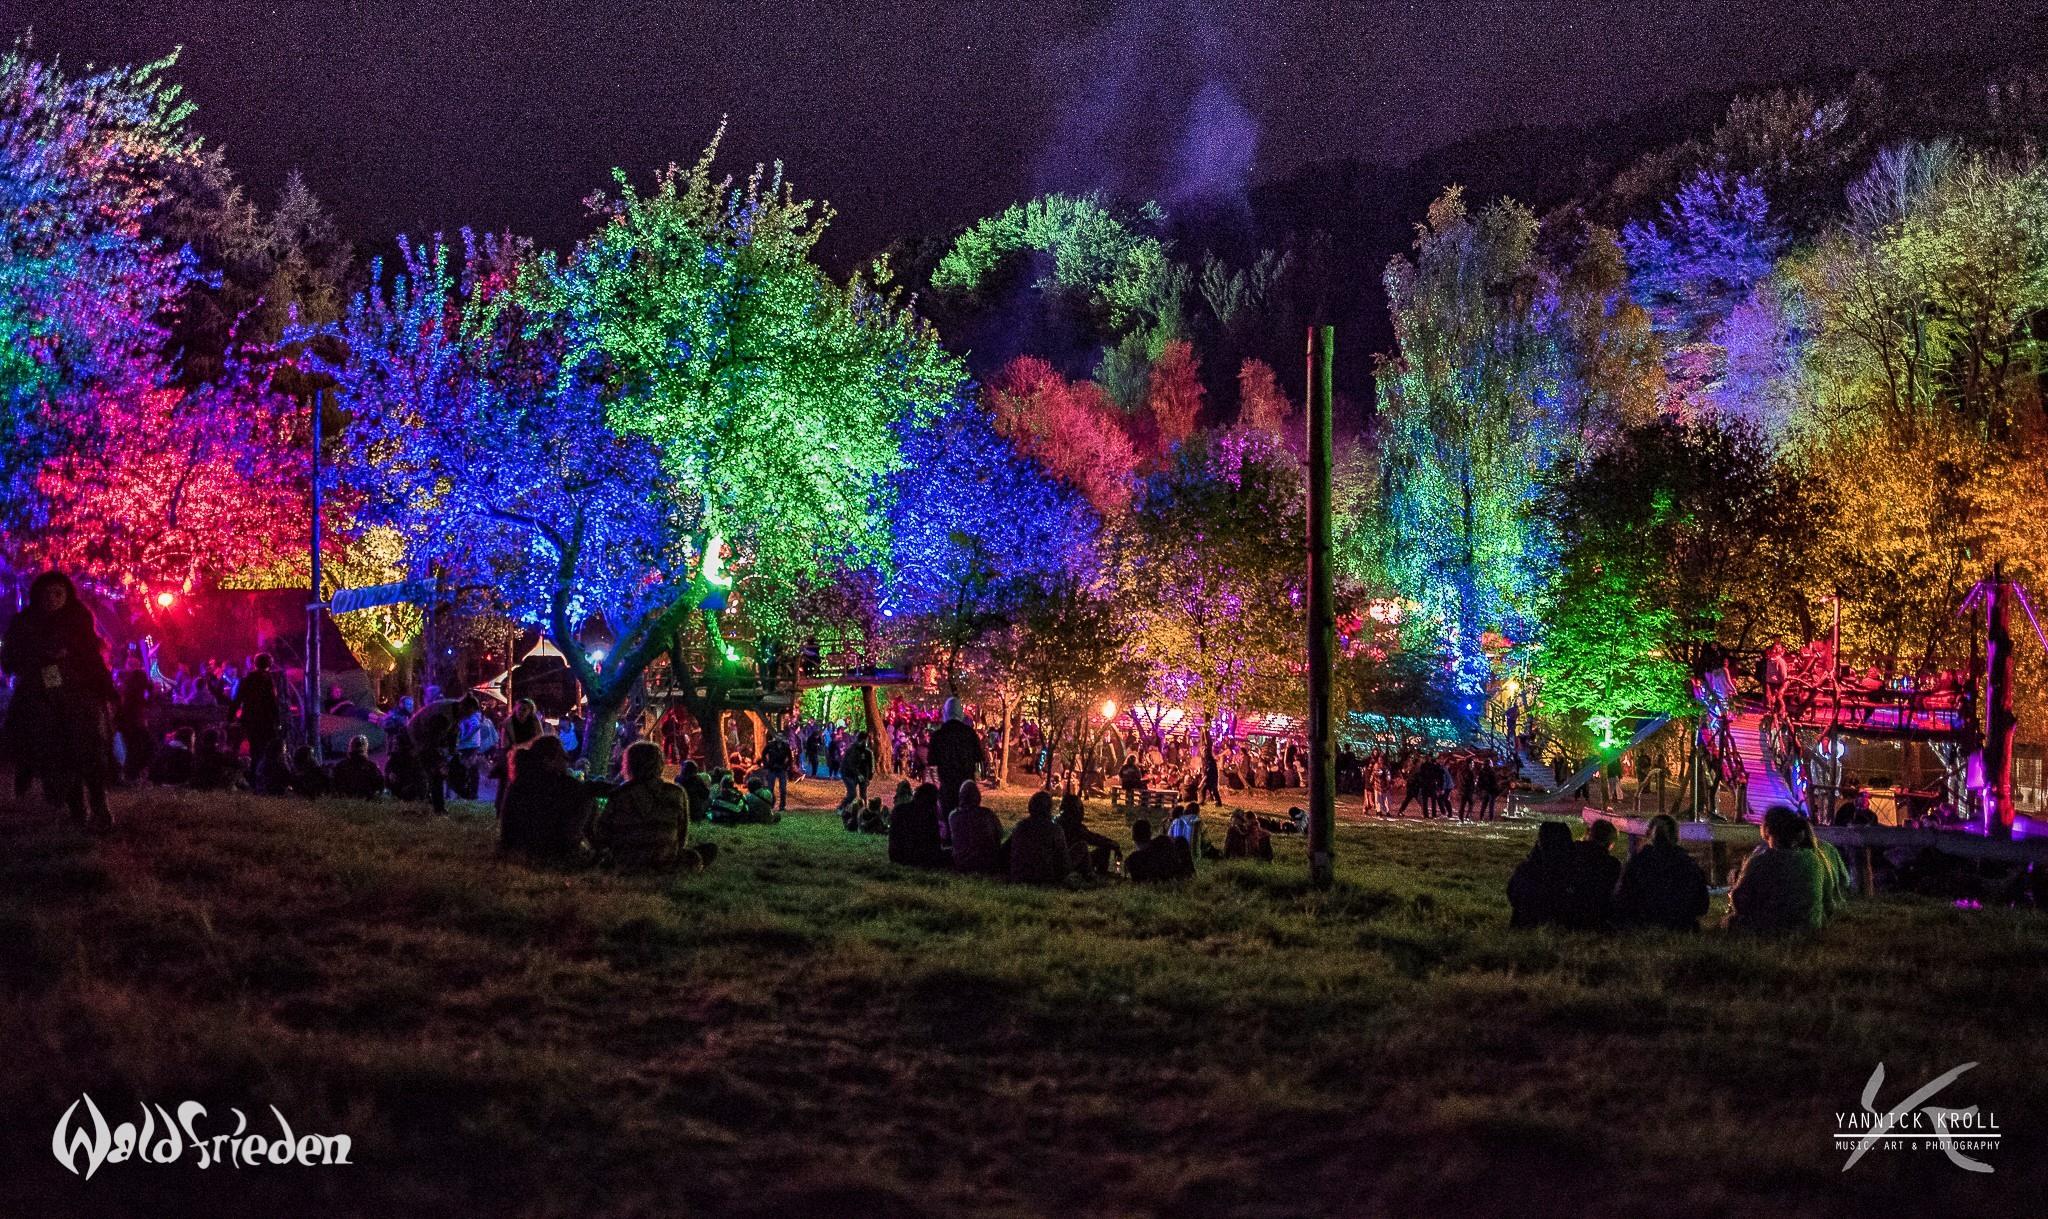 Wonderland Festival 2019 - Germany (22 08 2019-25 08 2019)